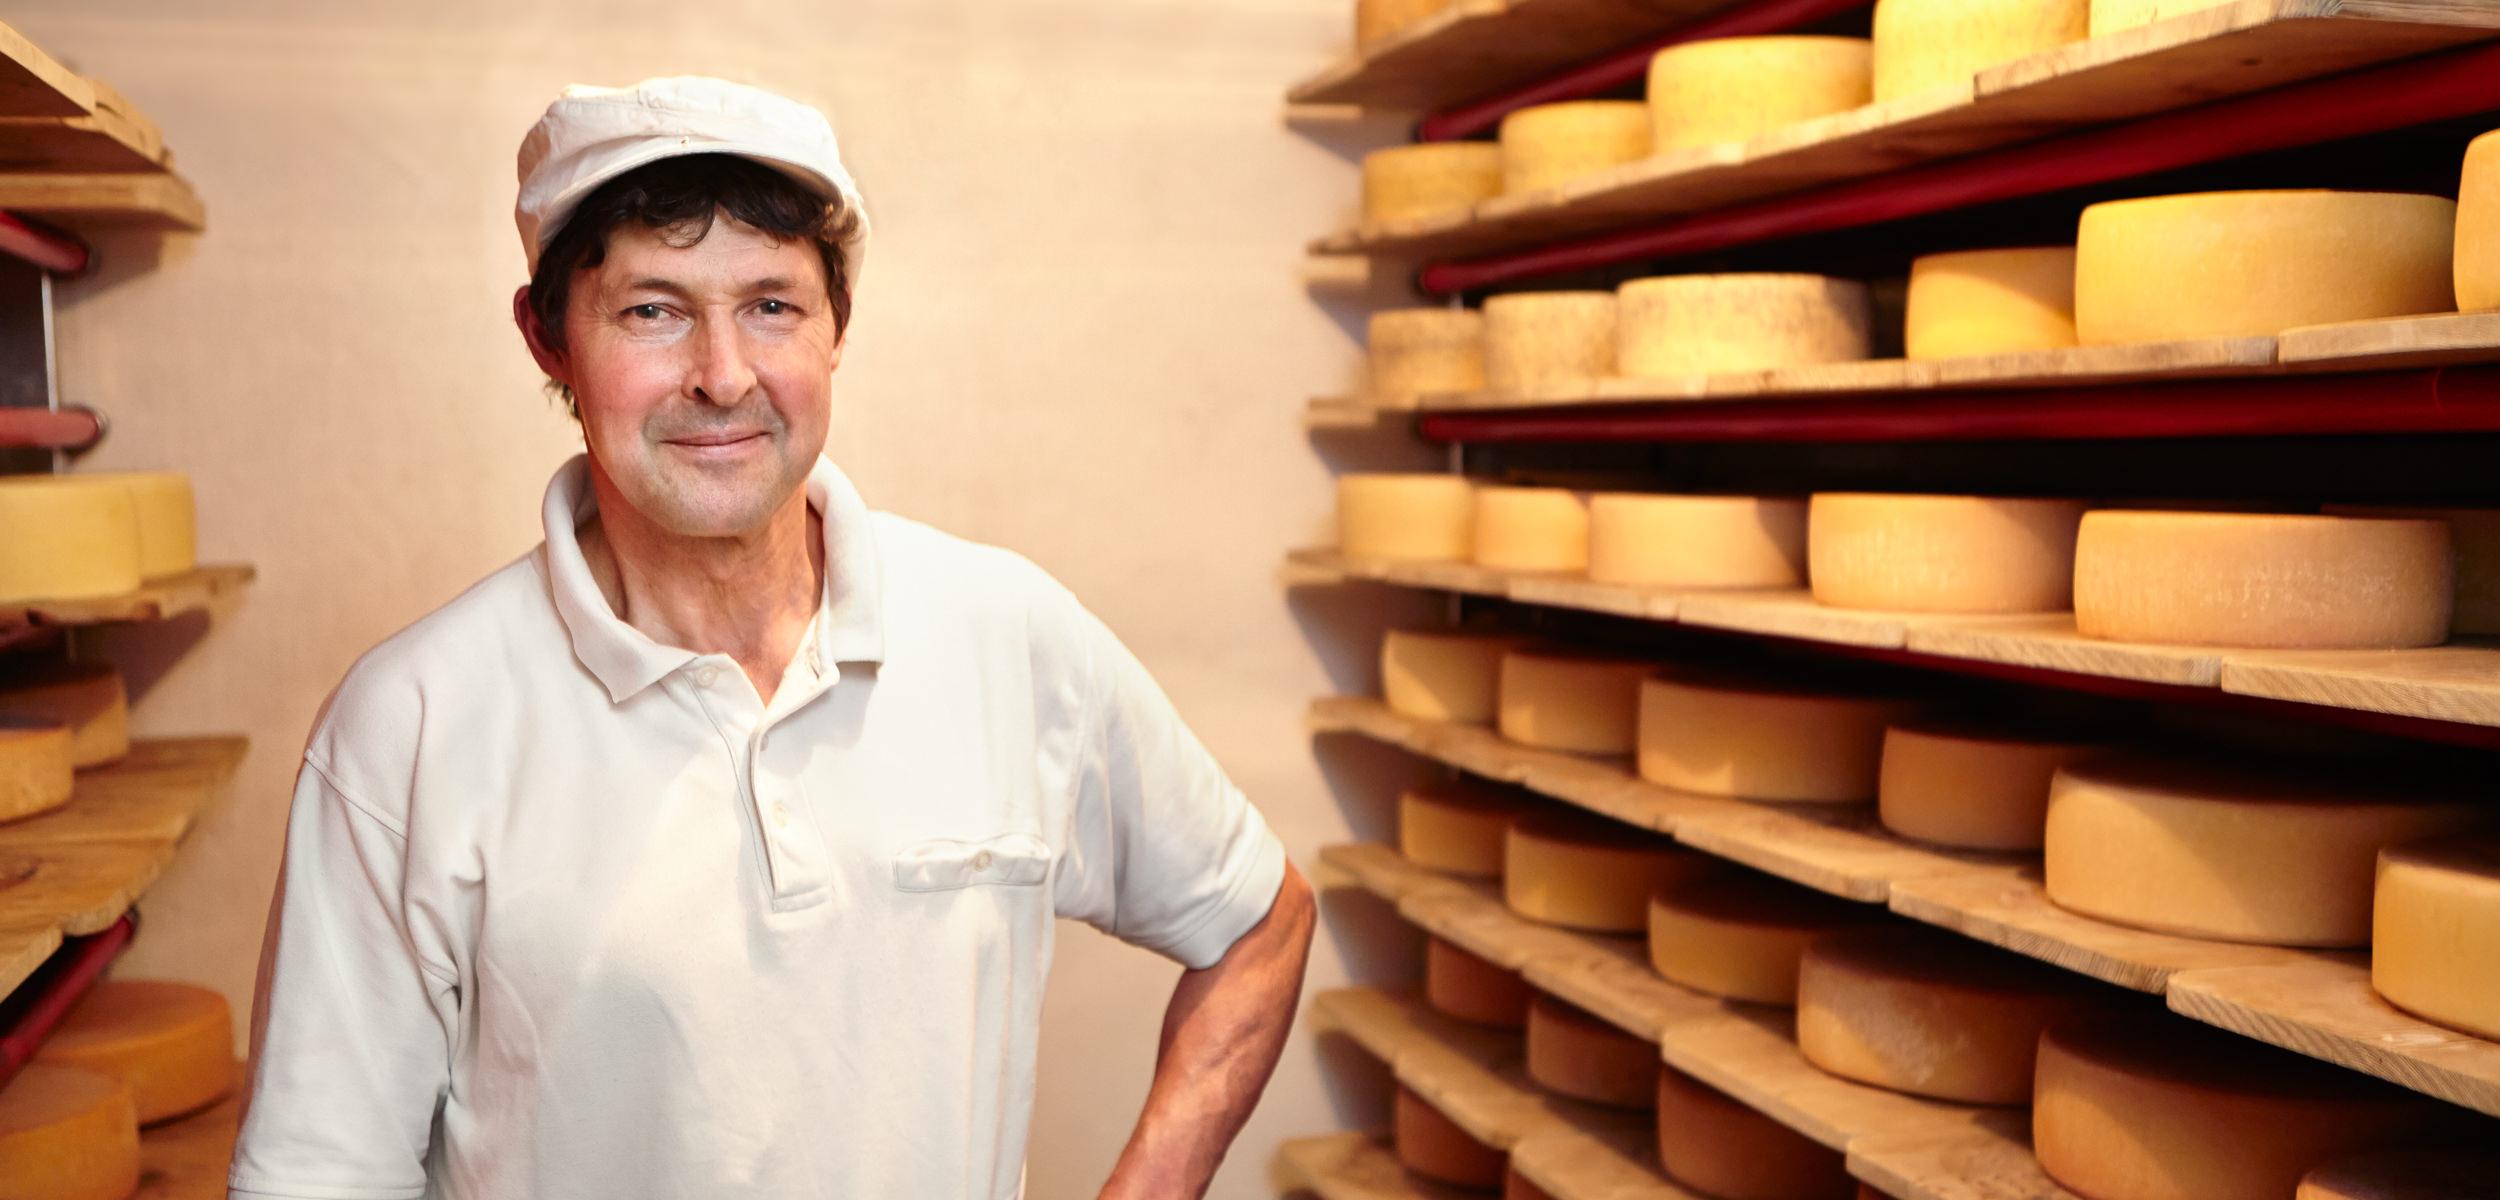 josef huber kraus käser honhardter demeterhöfe landwirtschaft käseherstellung käse lebensmittel demeter bio biolebensmittel jörn strojny